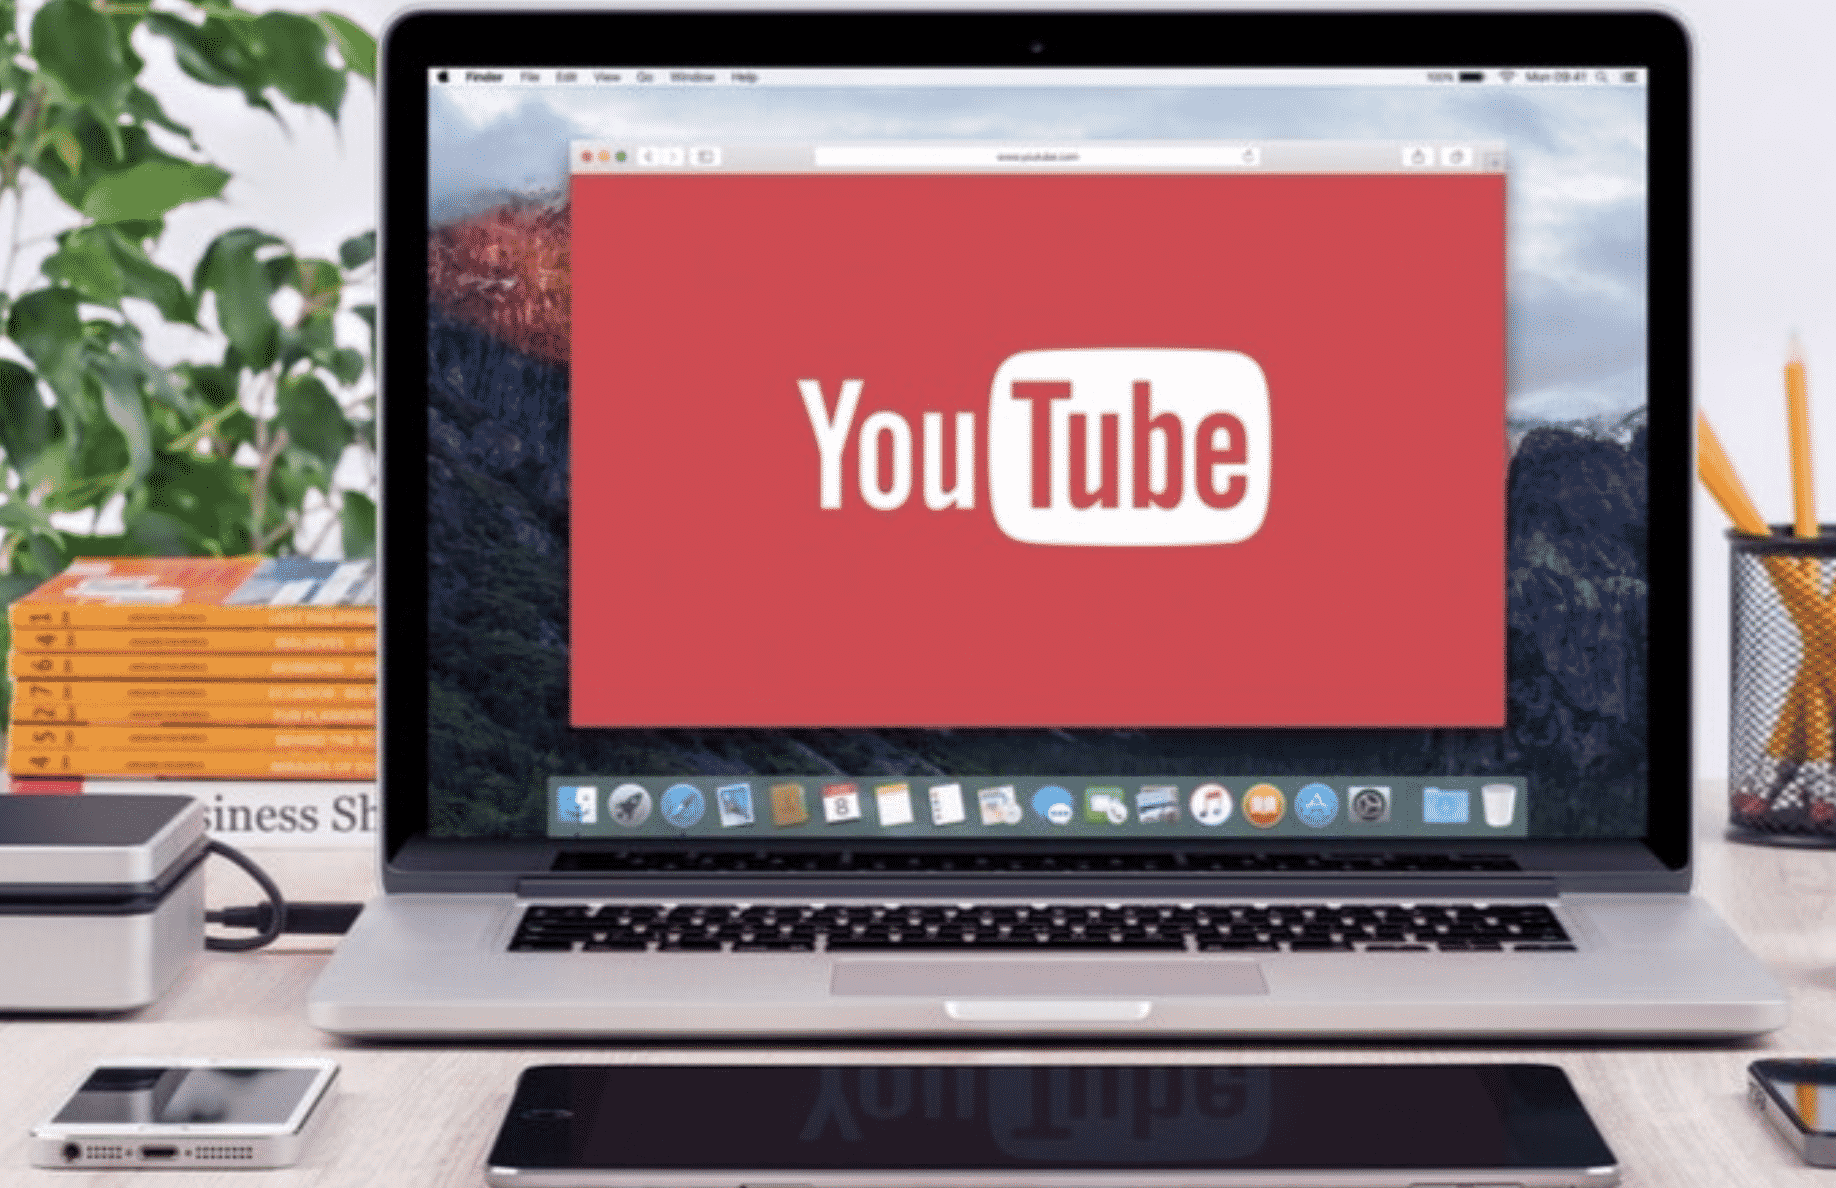 Buy YouTube Subscribers: Best sites to Buy YouTube Subscribers(Active&Legit)